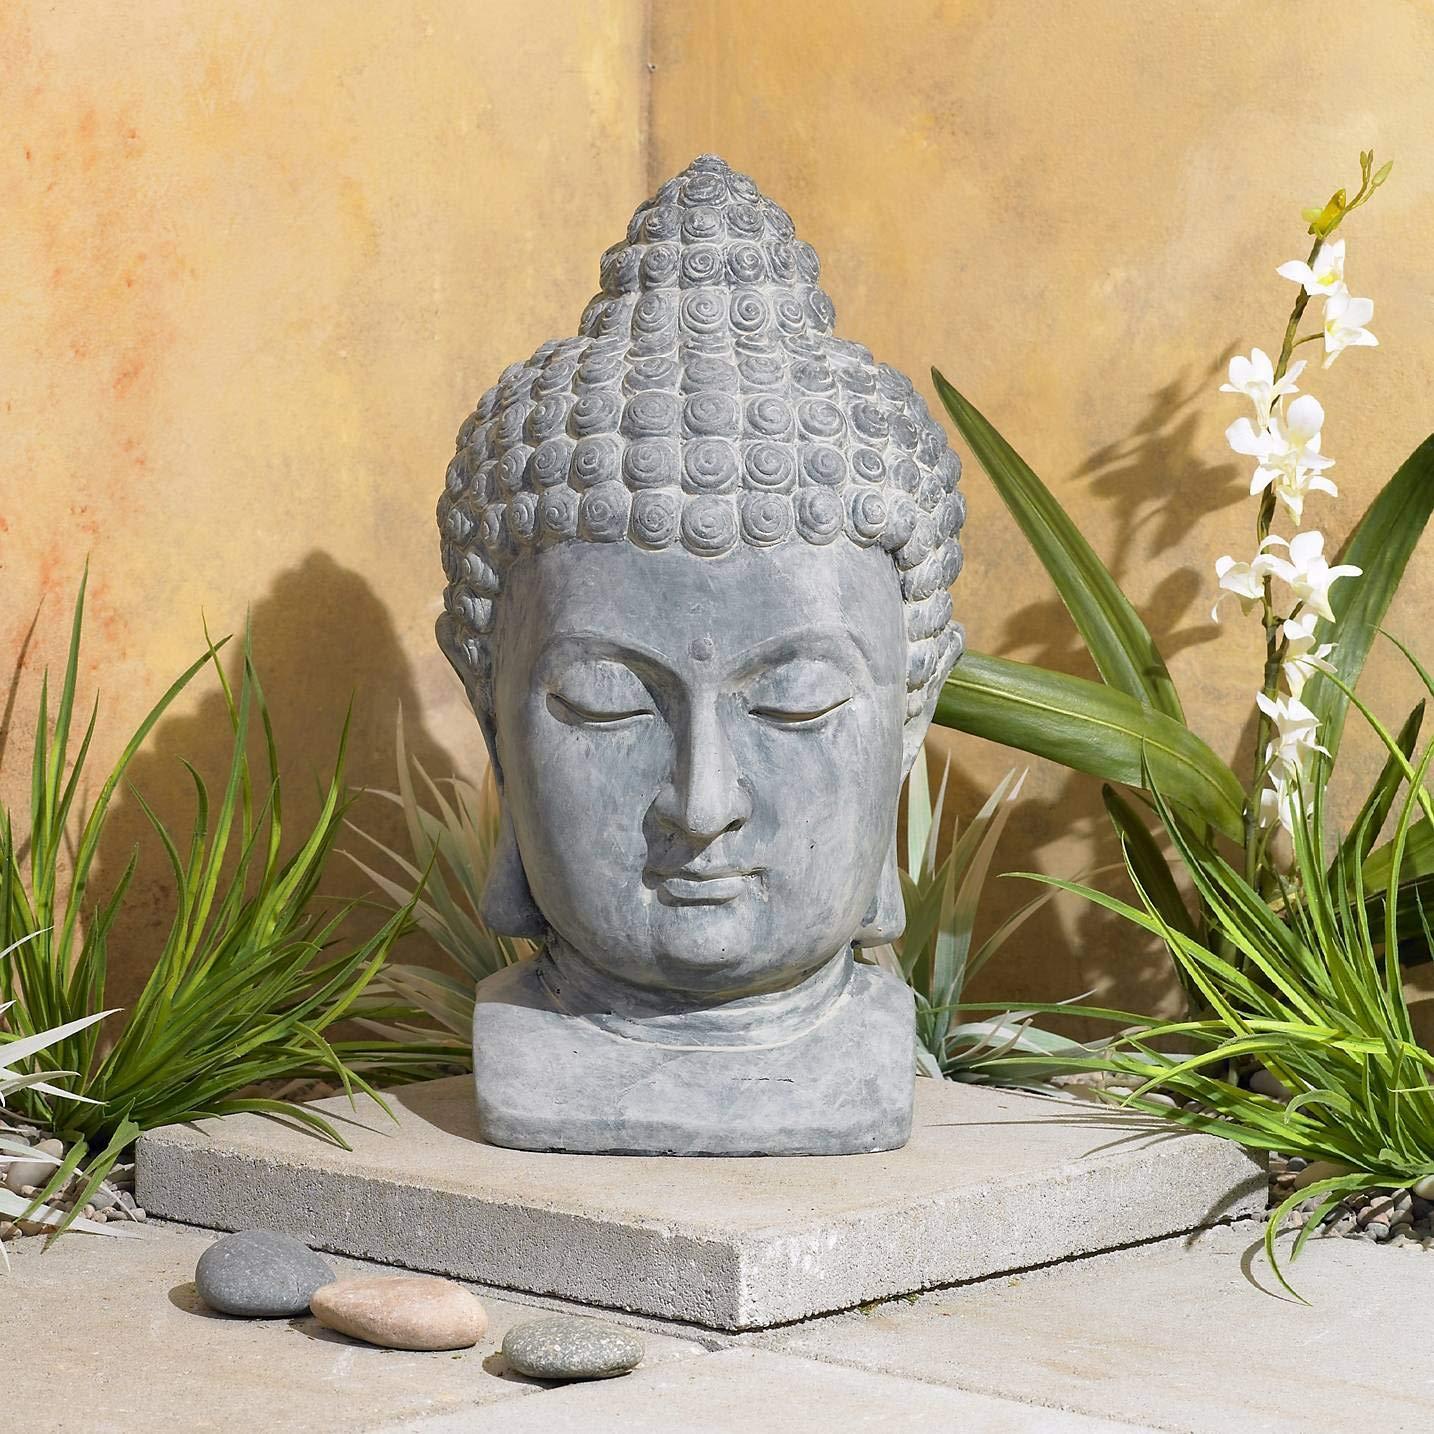 John Timberland Meditating Buddha Head 18 1/2'' High Outdoor Statue